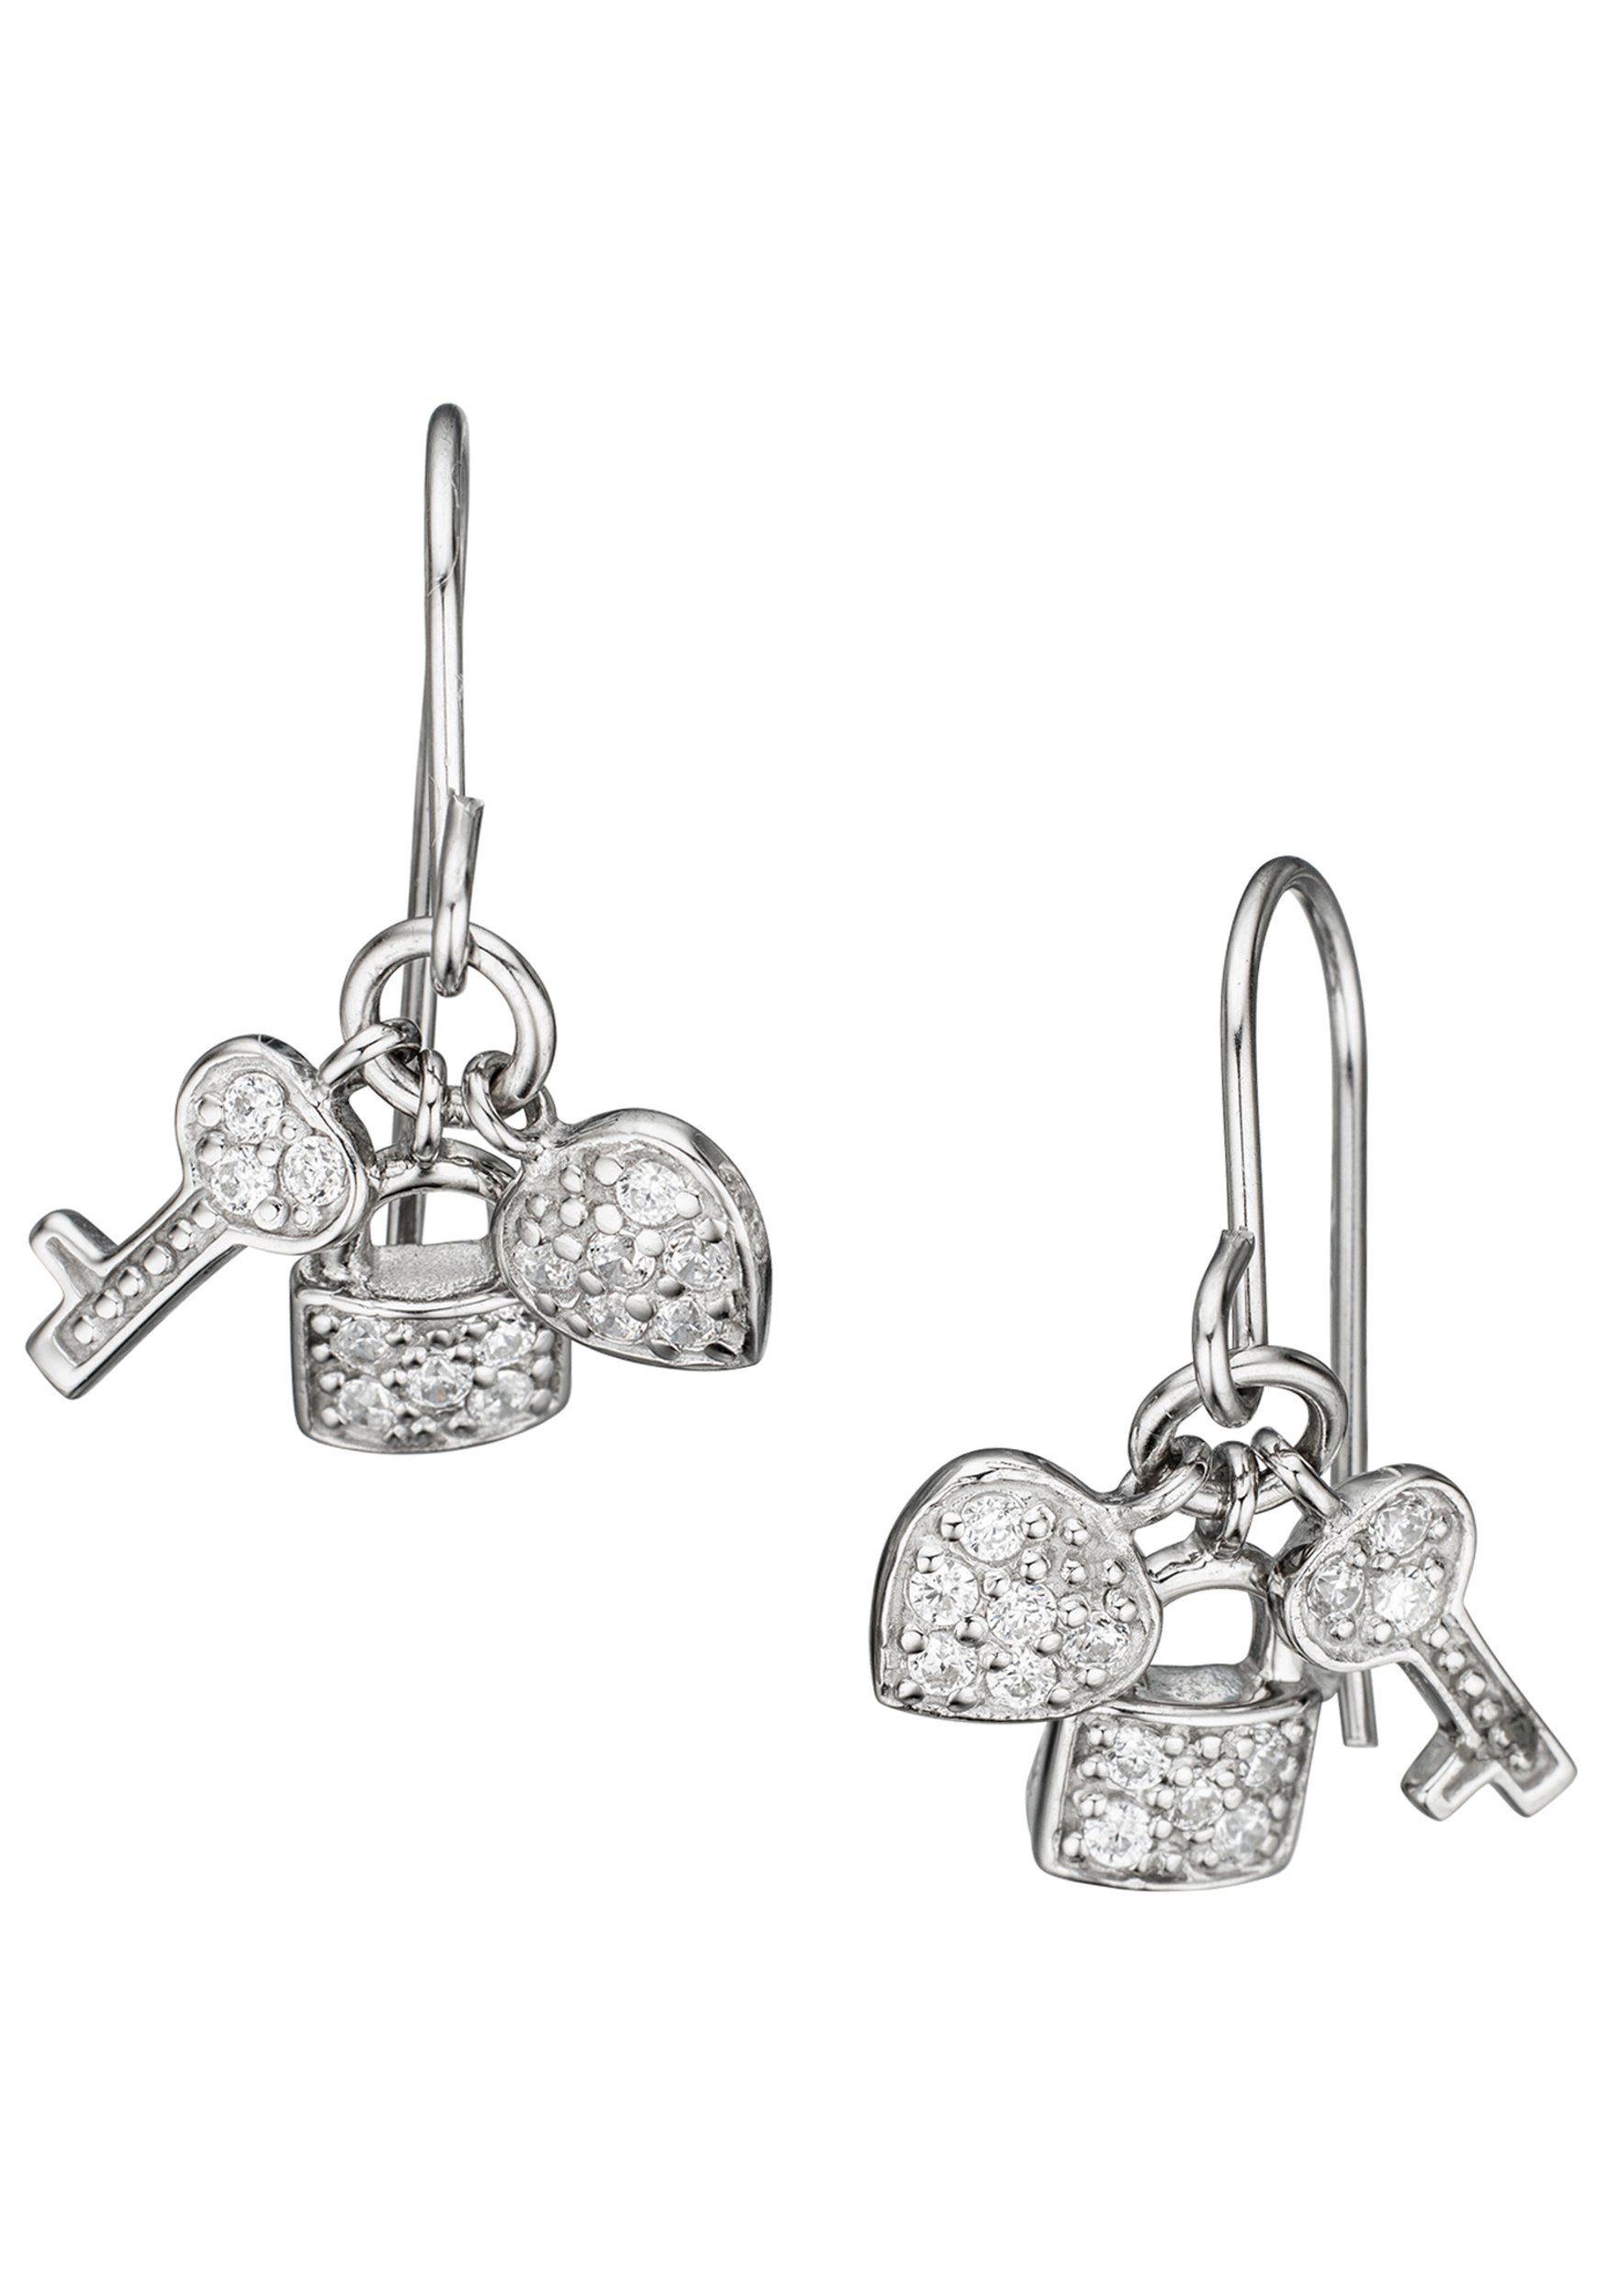 JOBO Paar Ohrhänger »Herz Schloss Schlüssel« 925 Silber mit Zirkonia